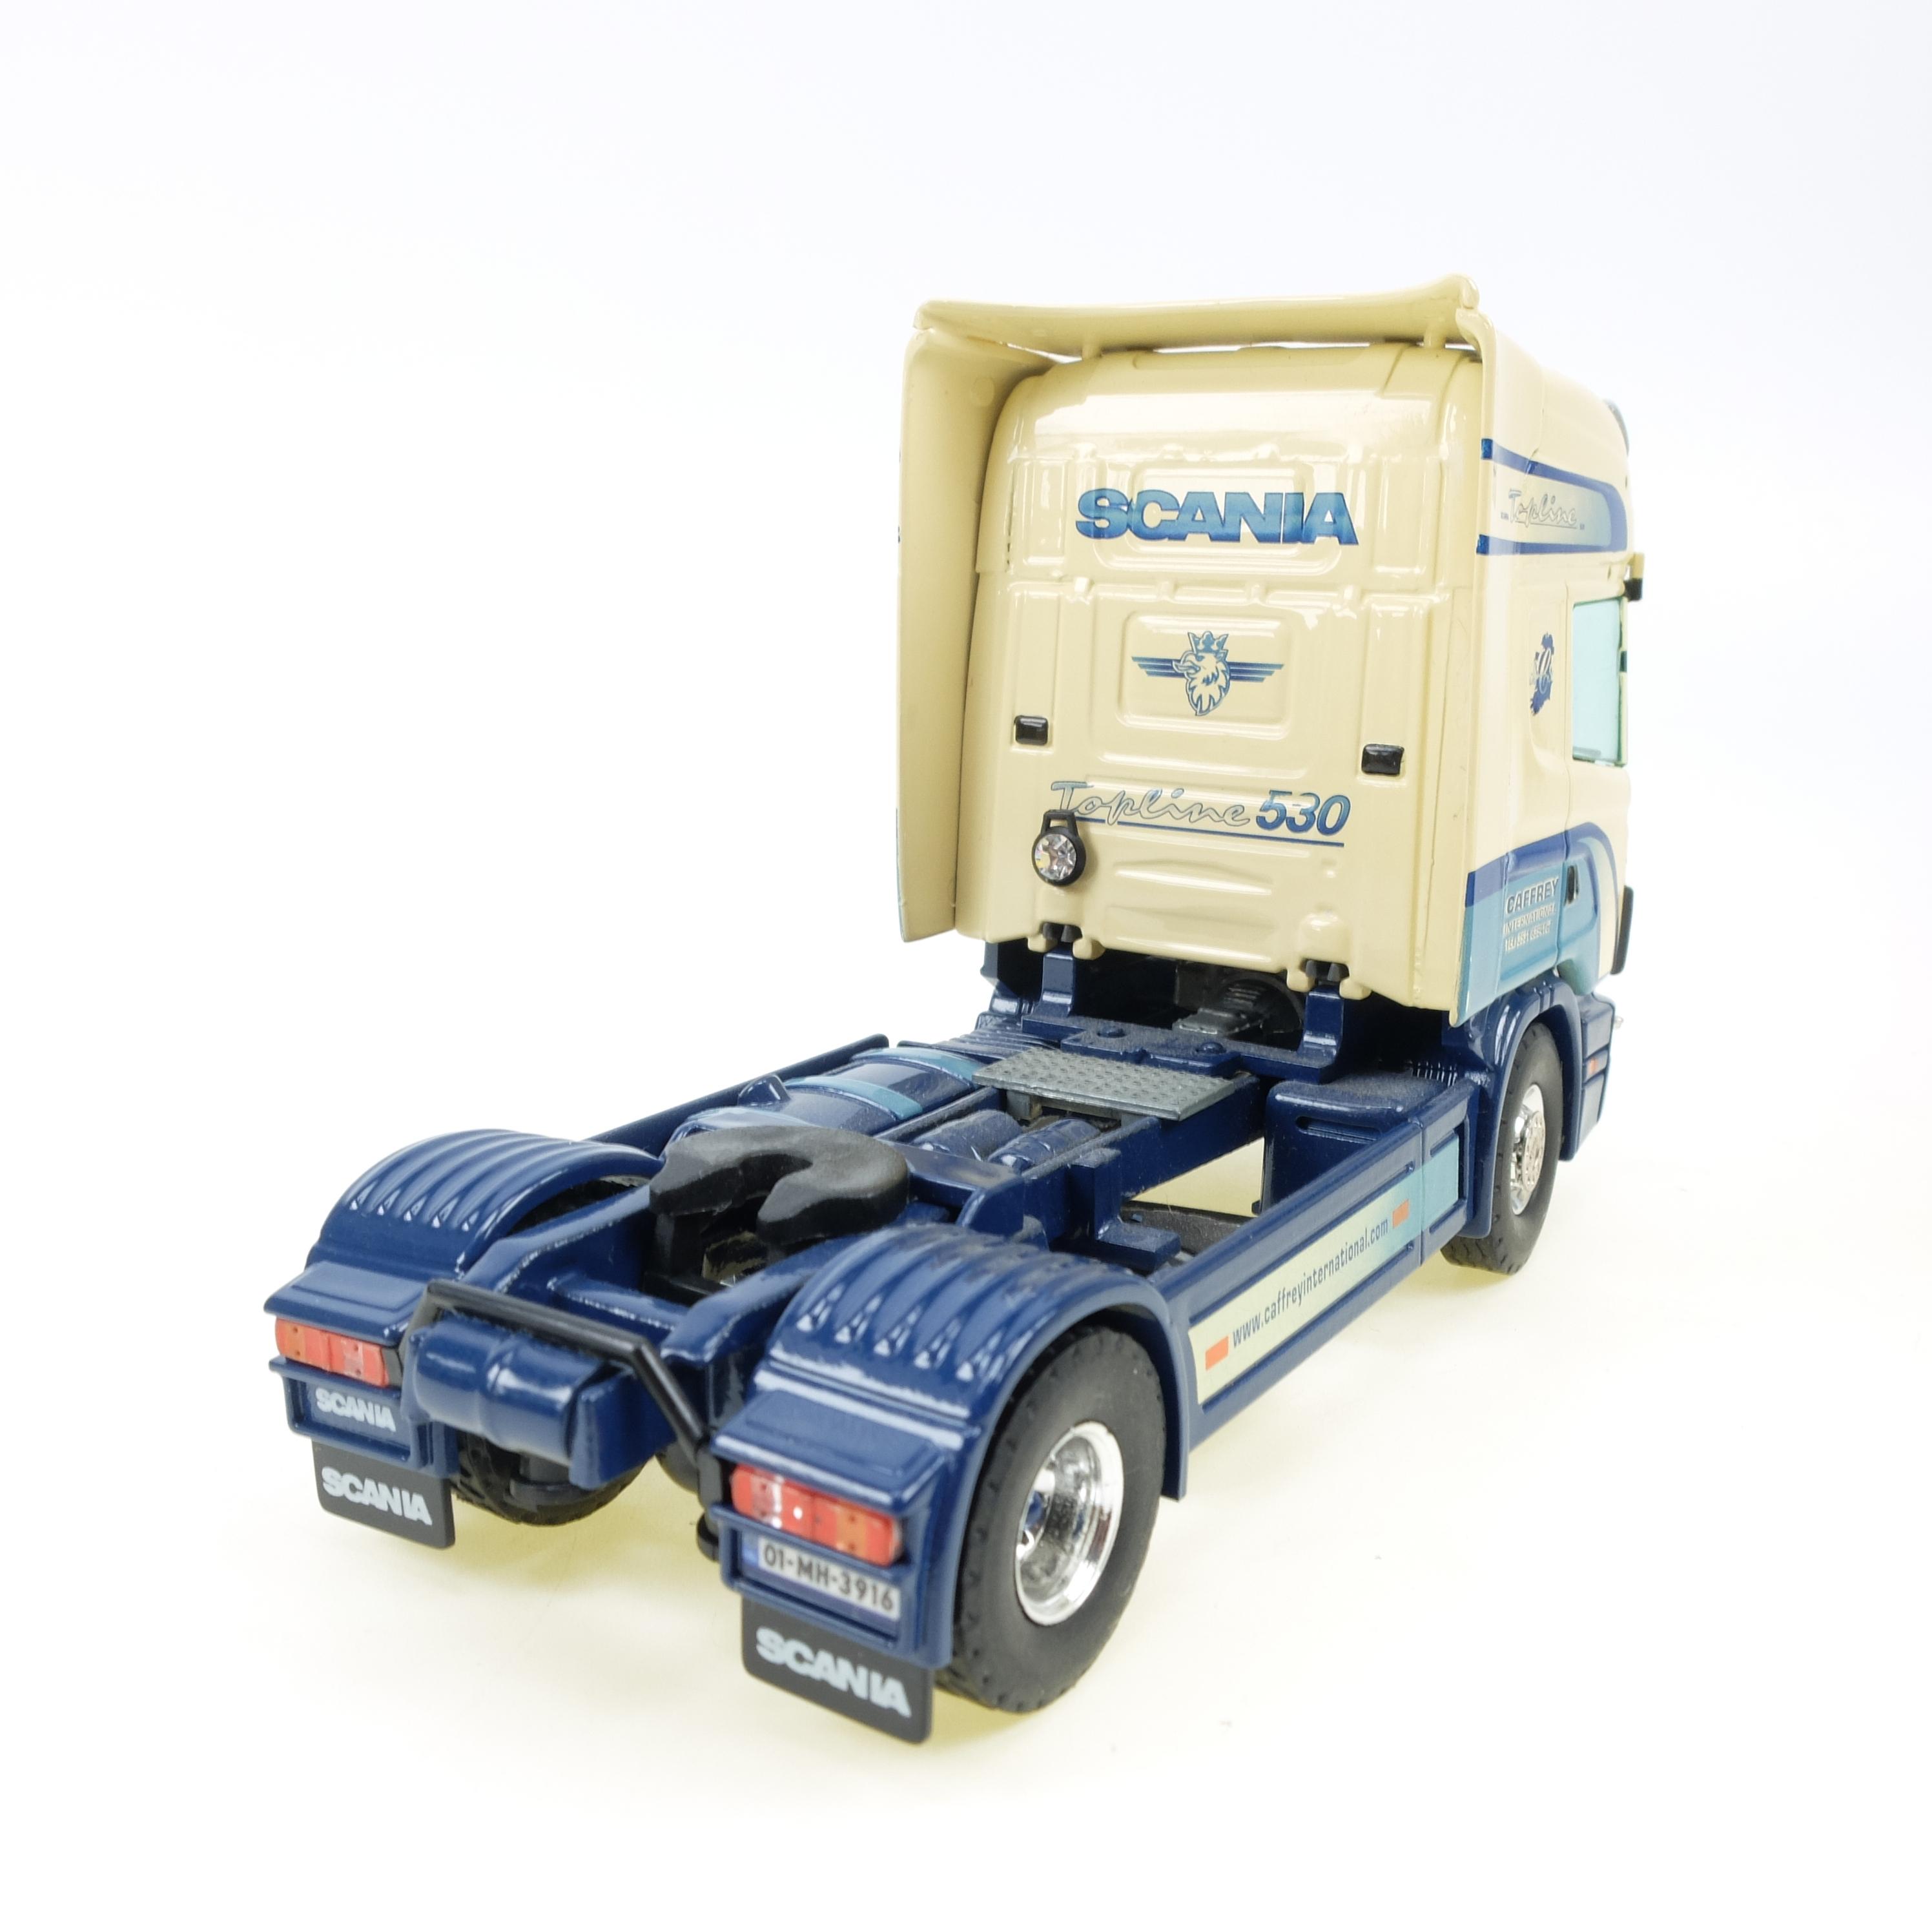 Scania kuehlauflieger Cafferey International